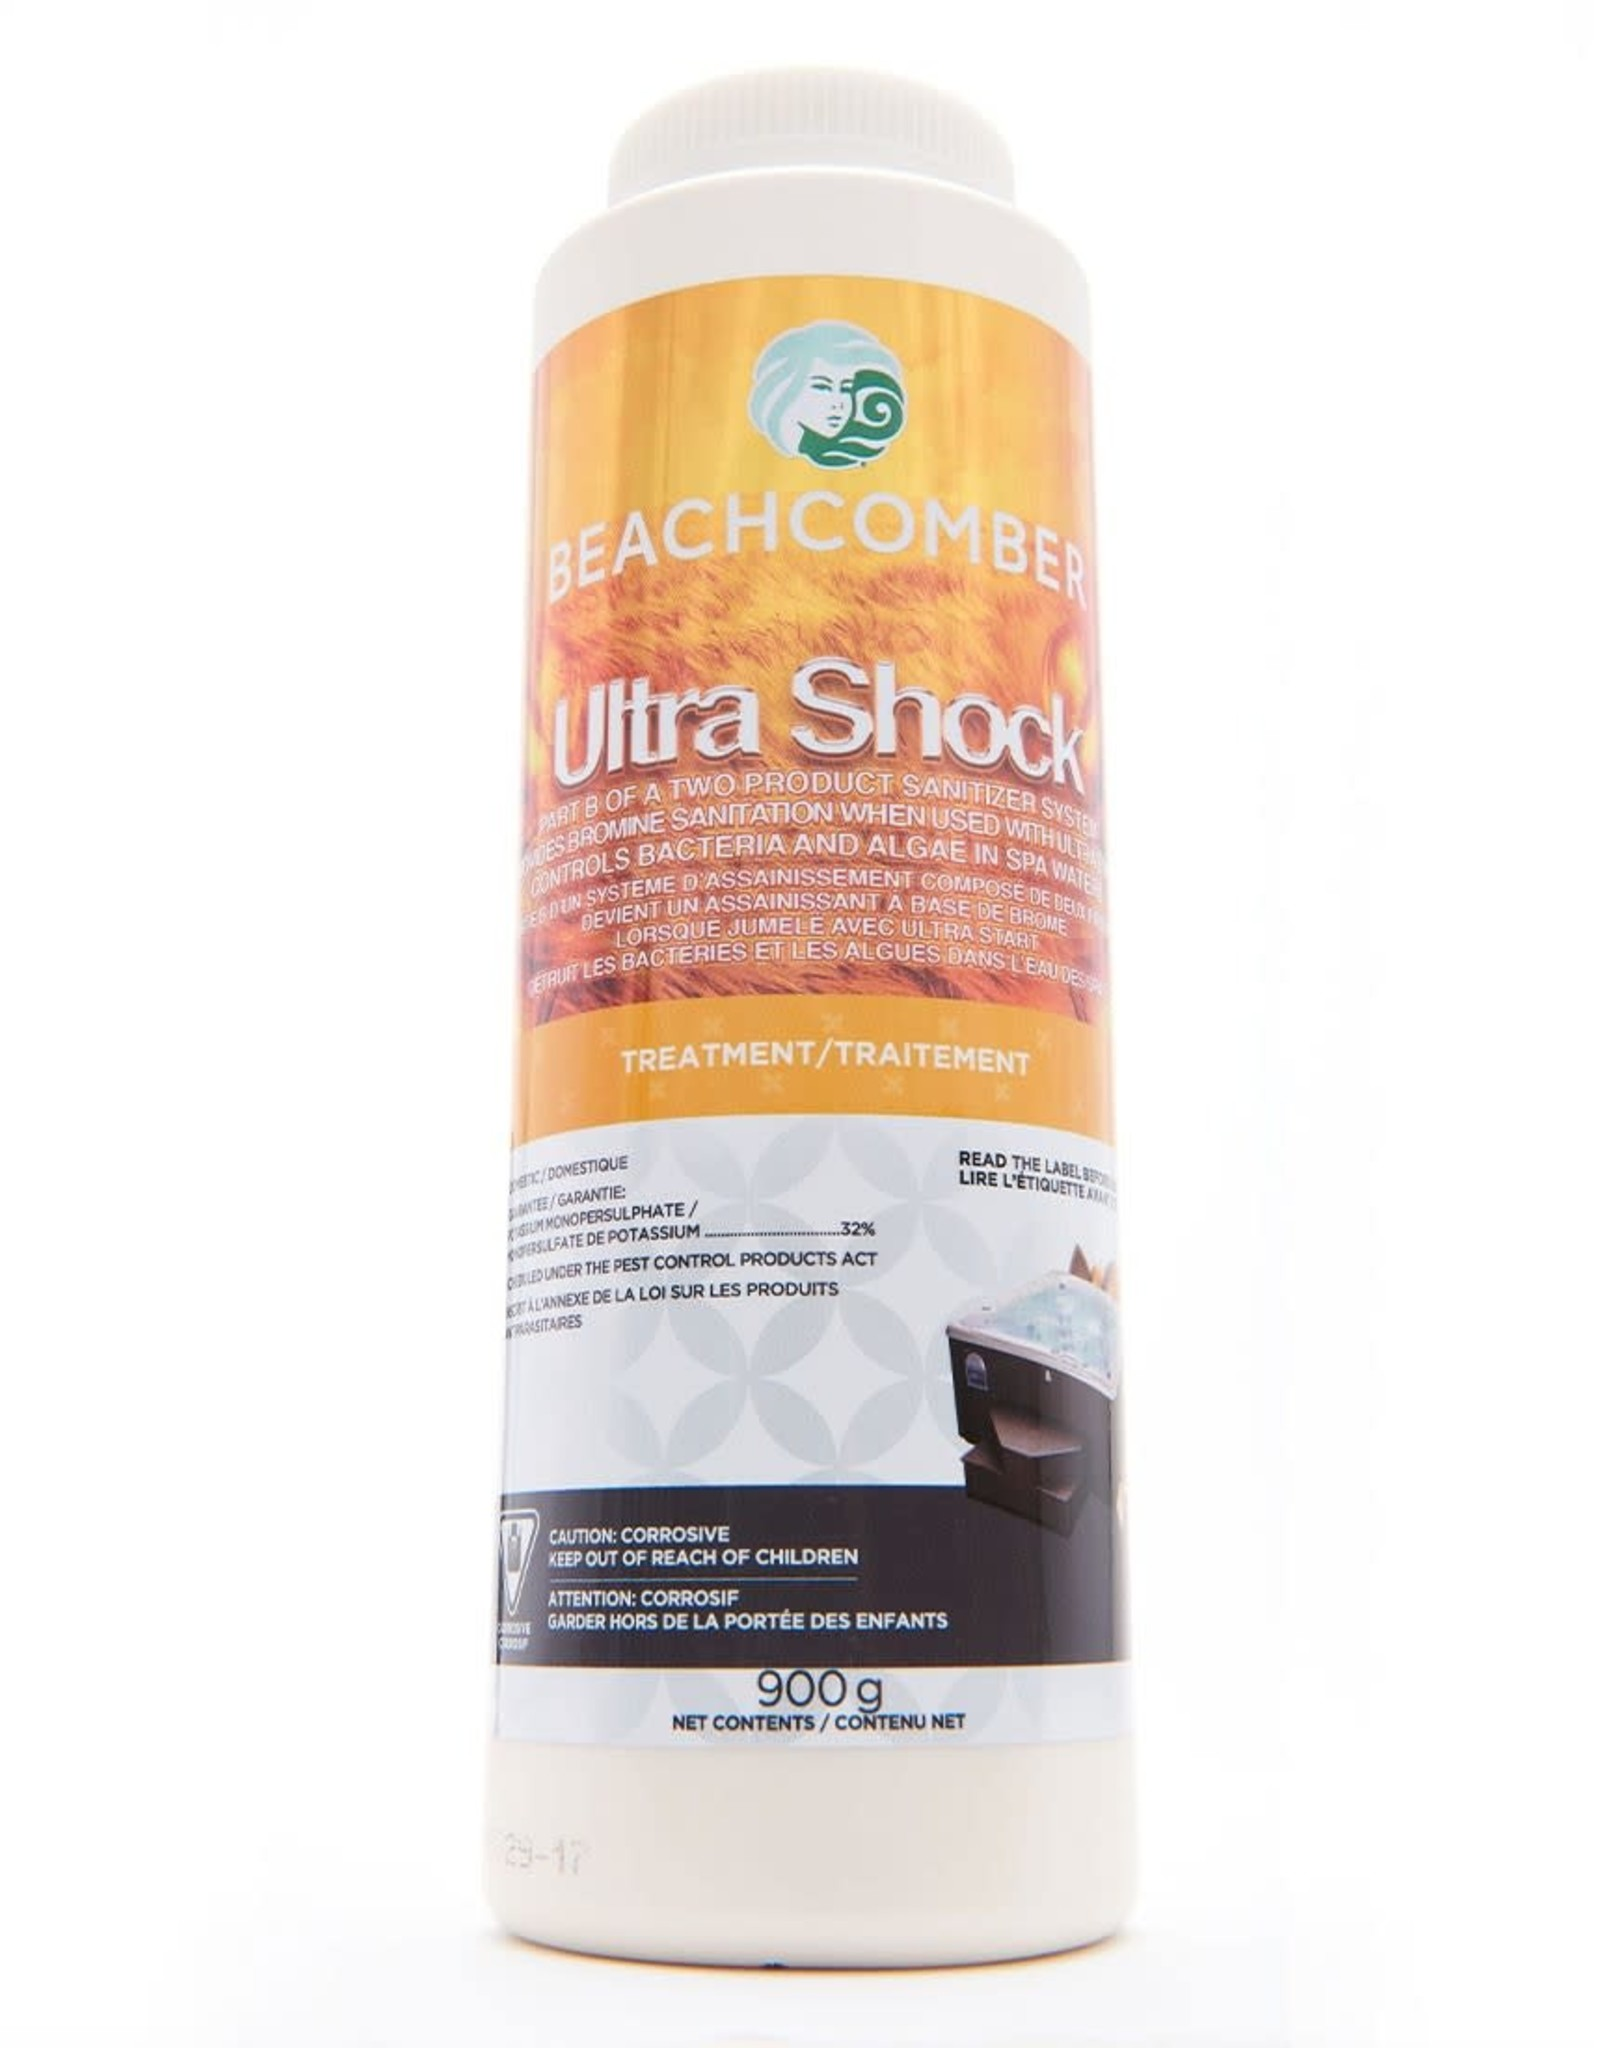 BEACHCOMBER ULTRA SHOCK - 900g